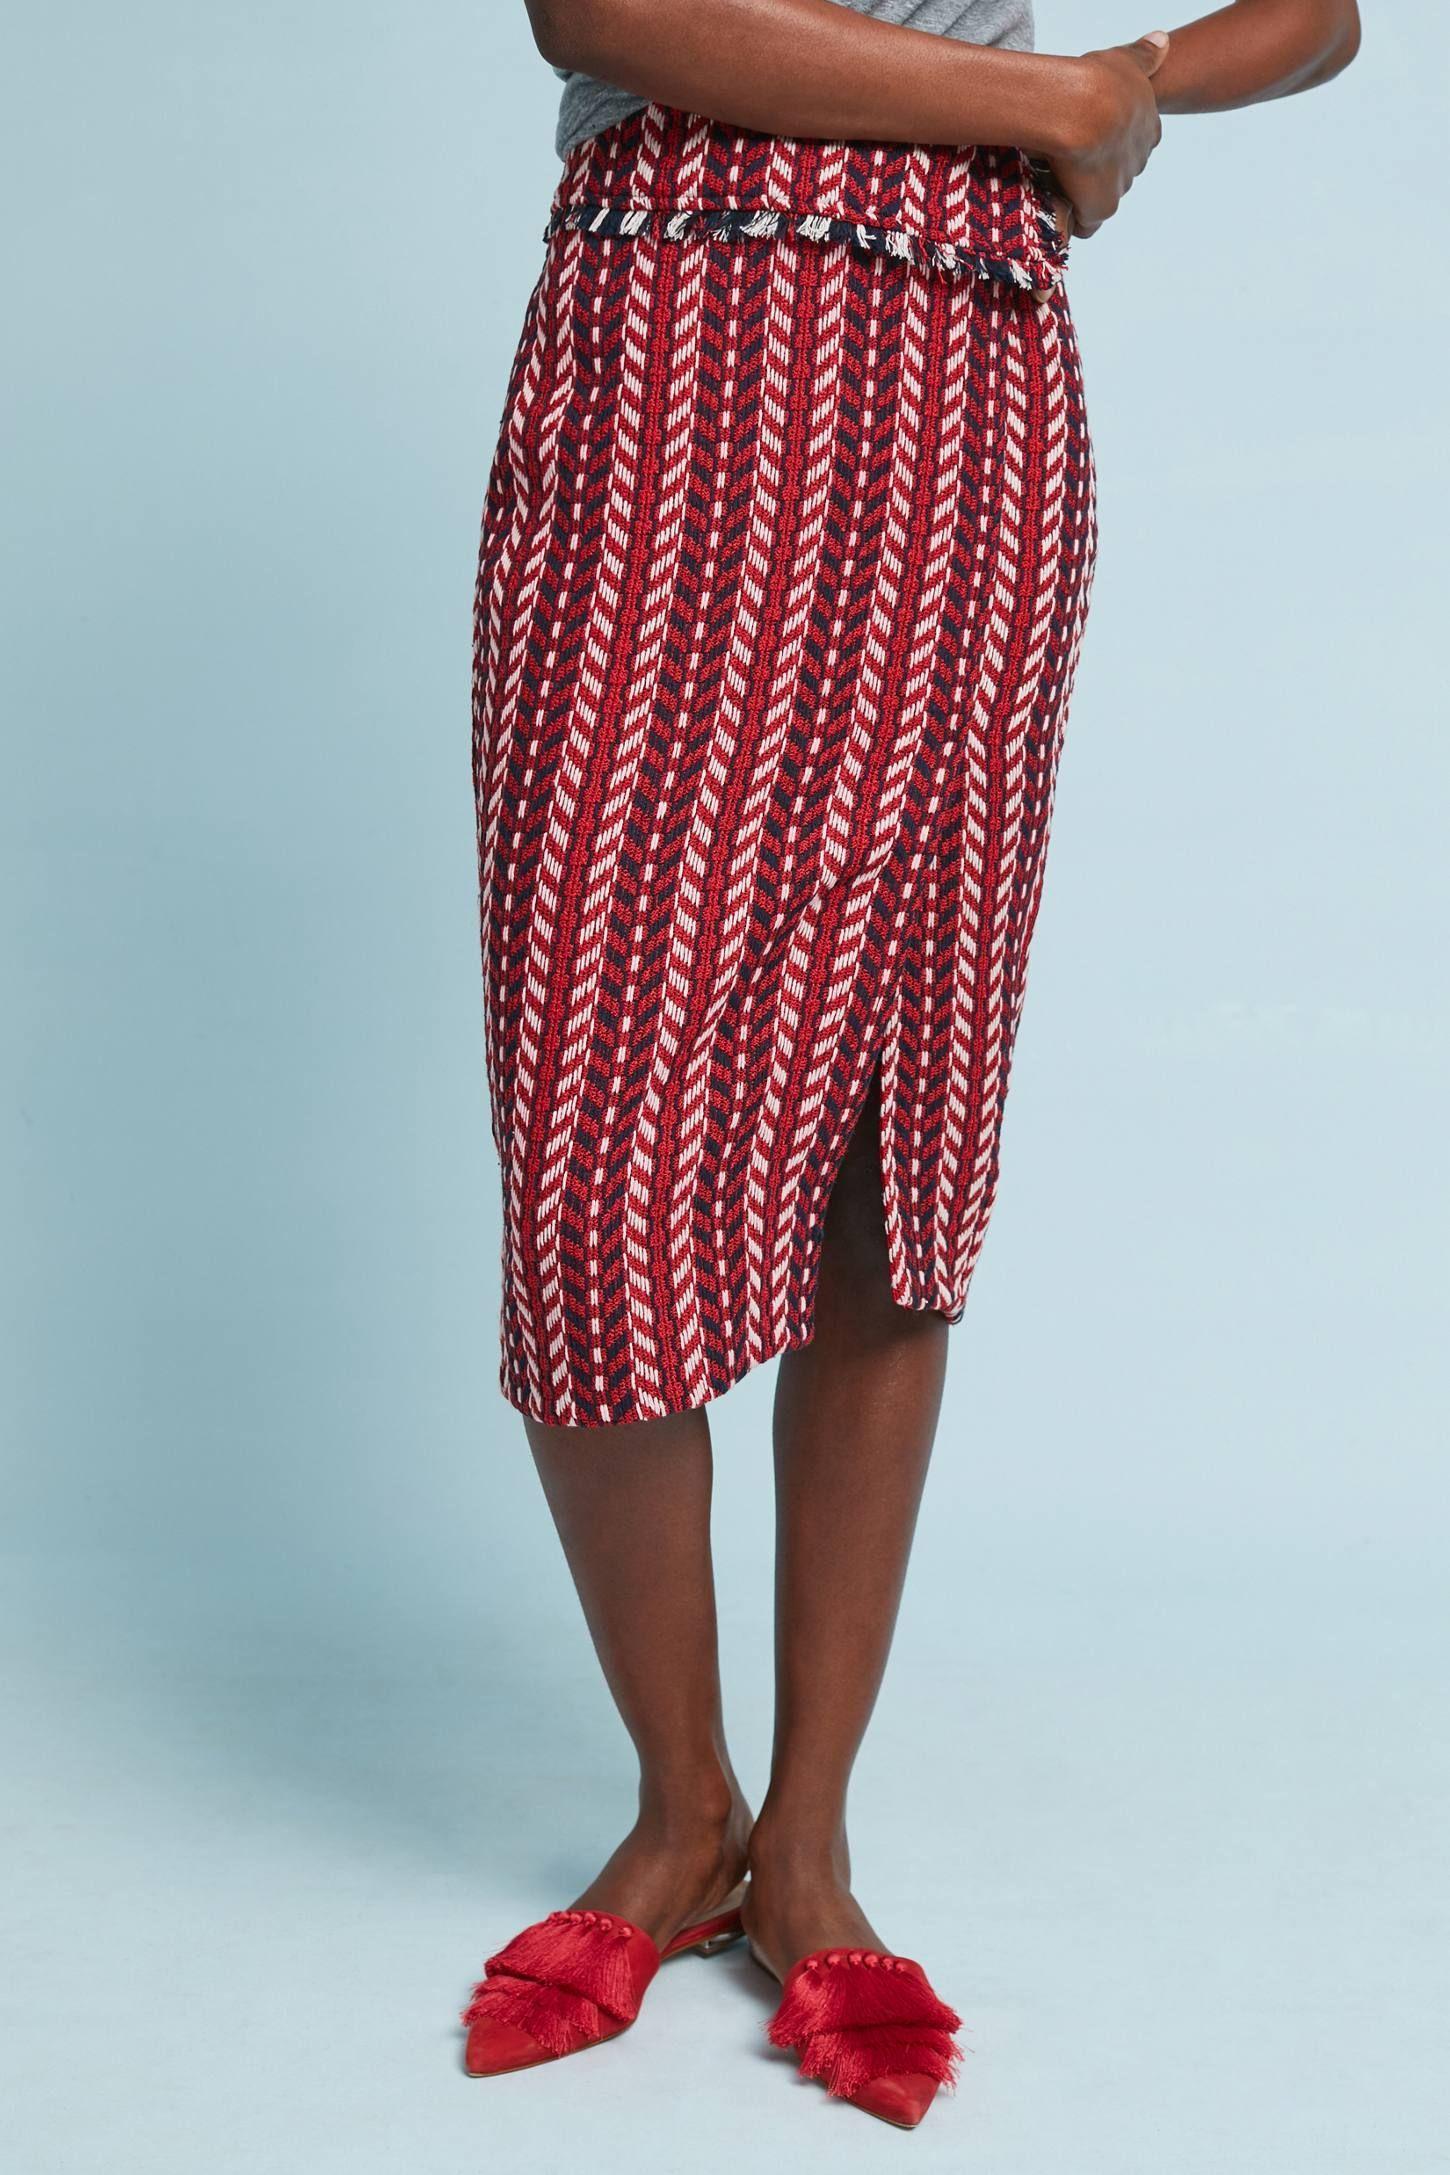 ba0cbafbb271 Tweed Foldover Pencil Skirt | My Clothes | Pinterest | Pencil skirts ...